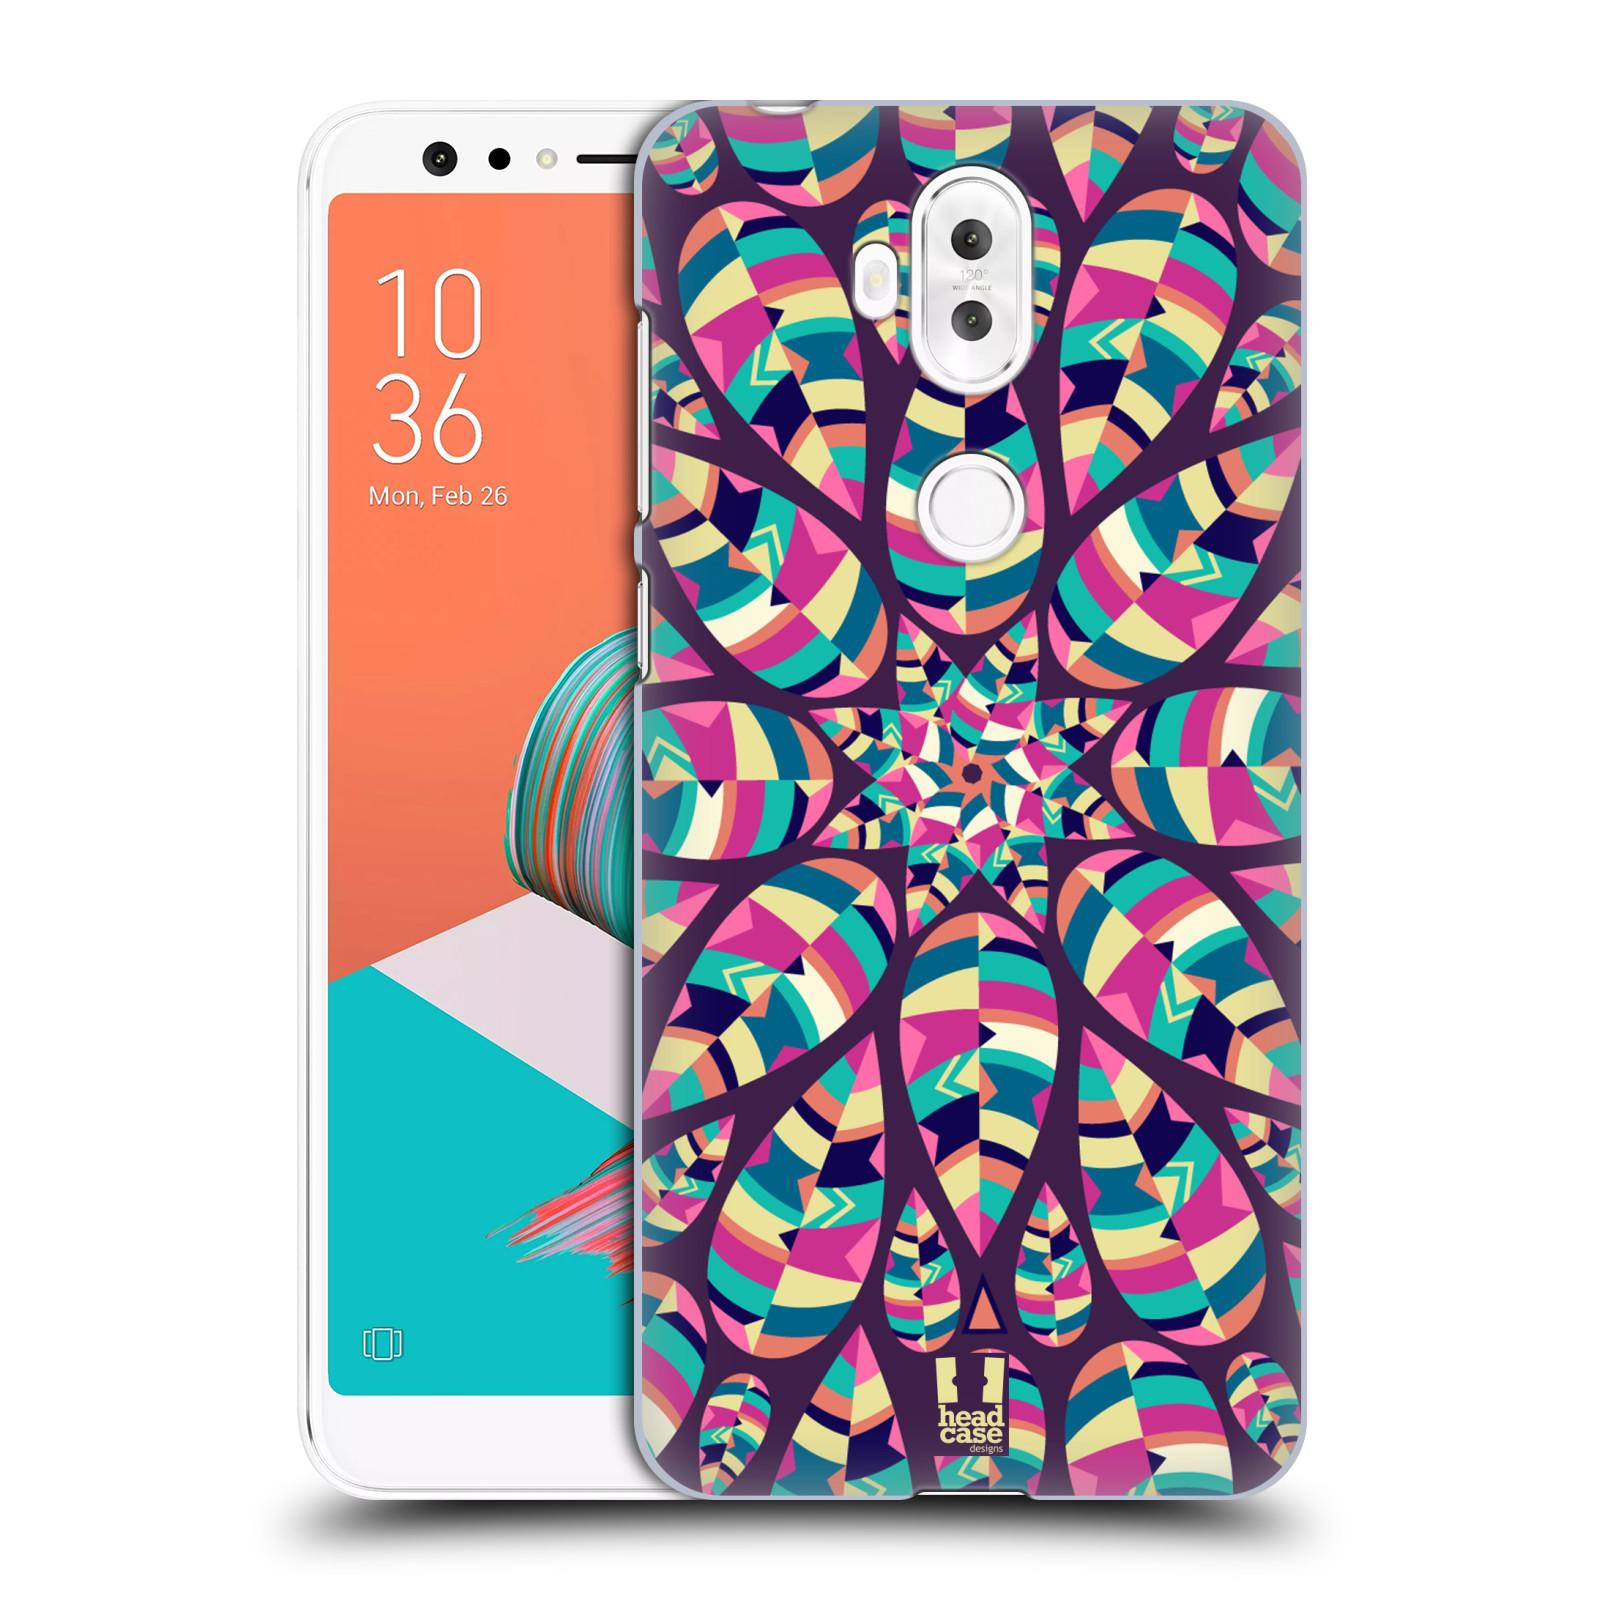 Plastové pouzdro na mobil Asus ZenFone 5 Lite ZC600KL - Head Case - Shine (Plastový kryt či obal na mobilní telefon Asus ZenFone 5 Lite (ZC600KL) s motivem Shine)